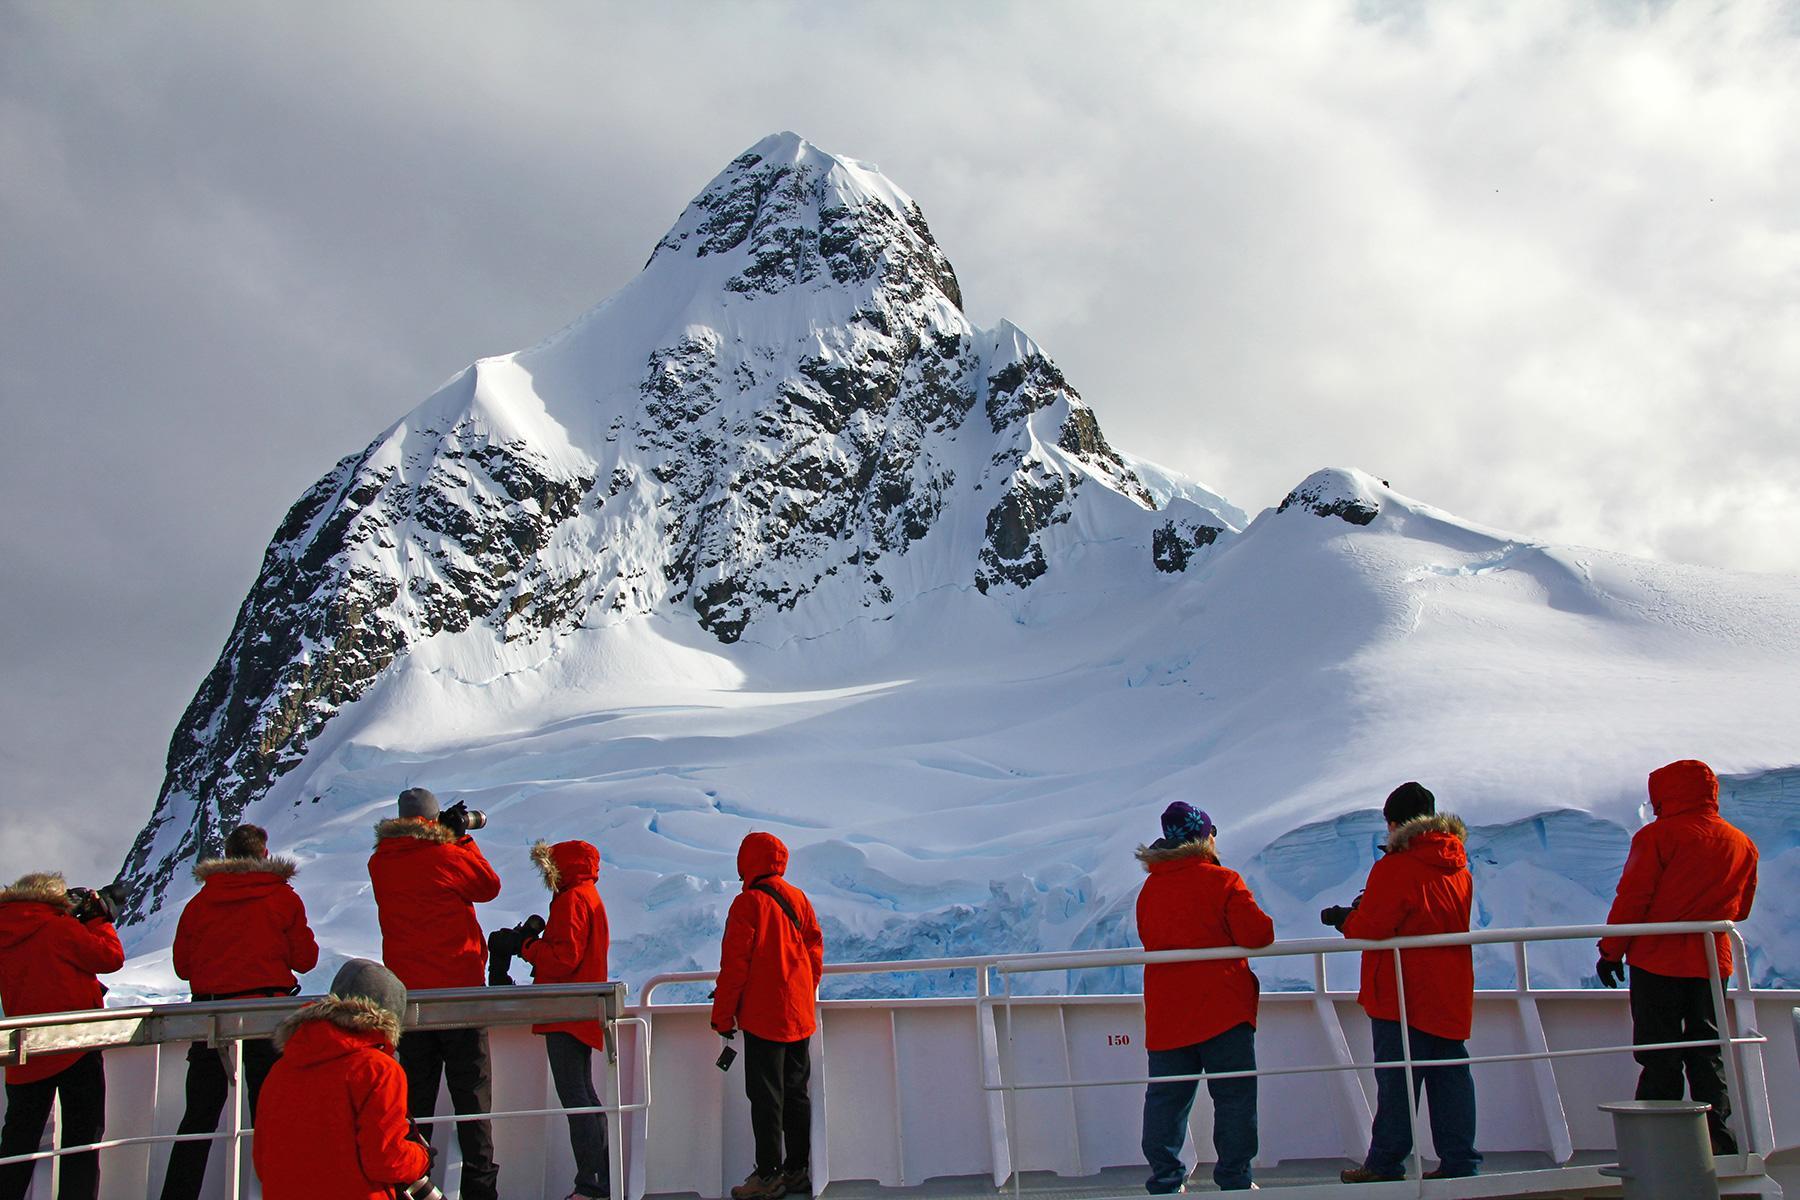 14_Antartica101_DontNeedBring Boots_shutterstock_757593991_1